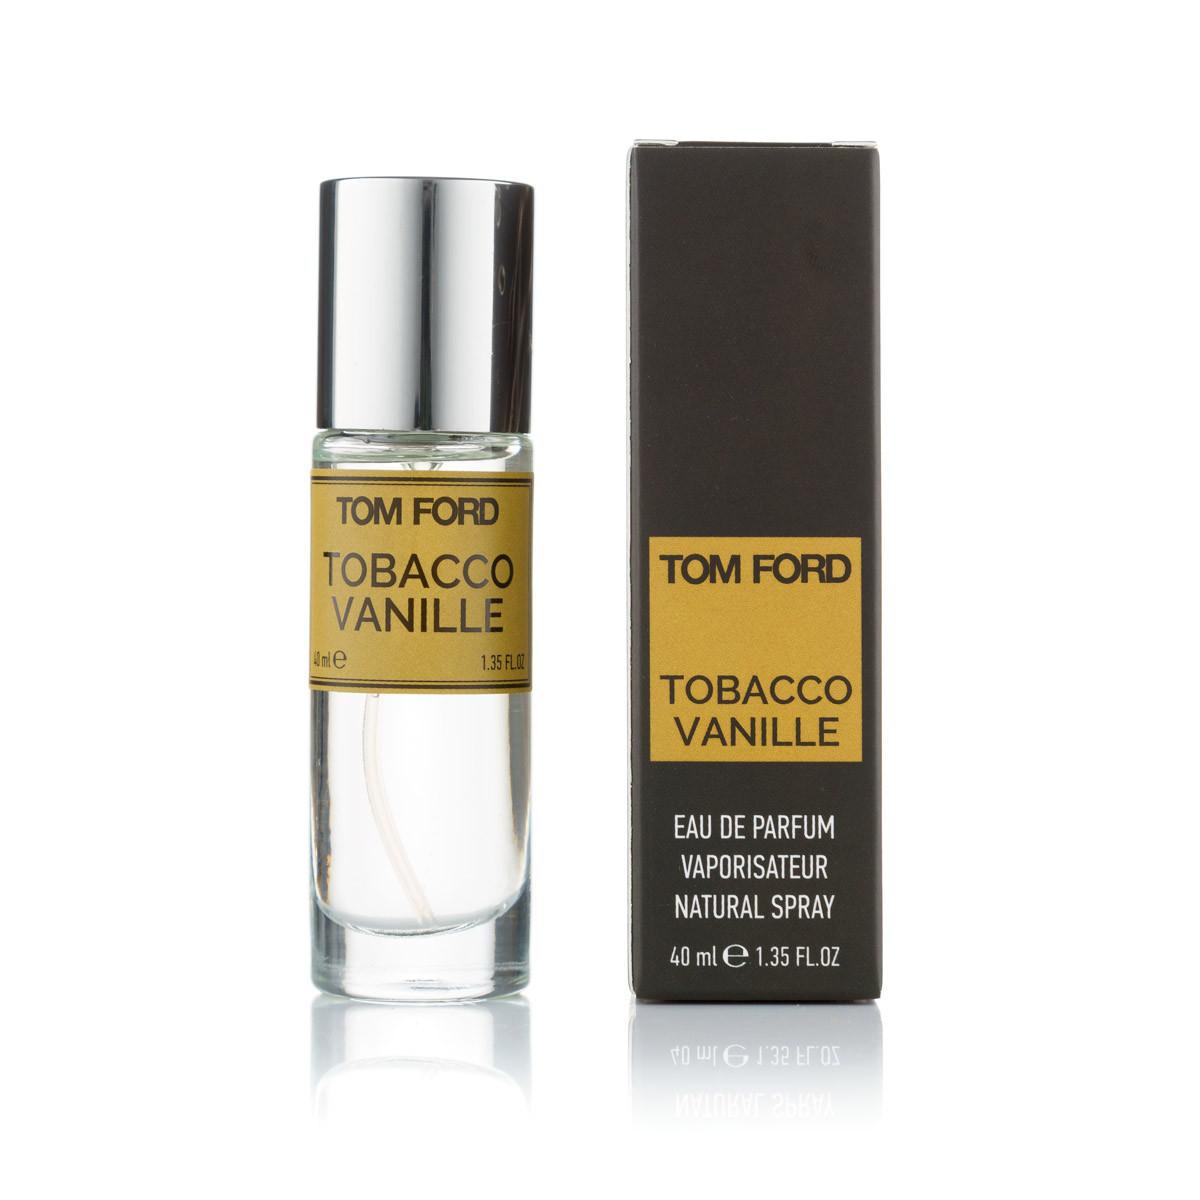 40 мл мини парфюм Tom Ford Tobacco Vanille (Унисекс)  (320)